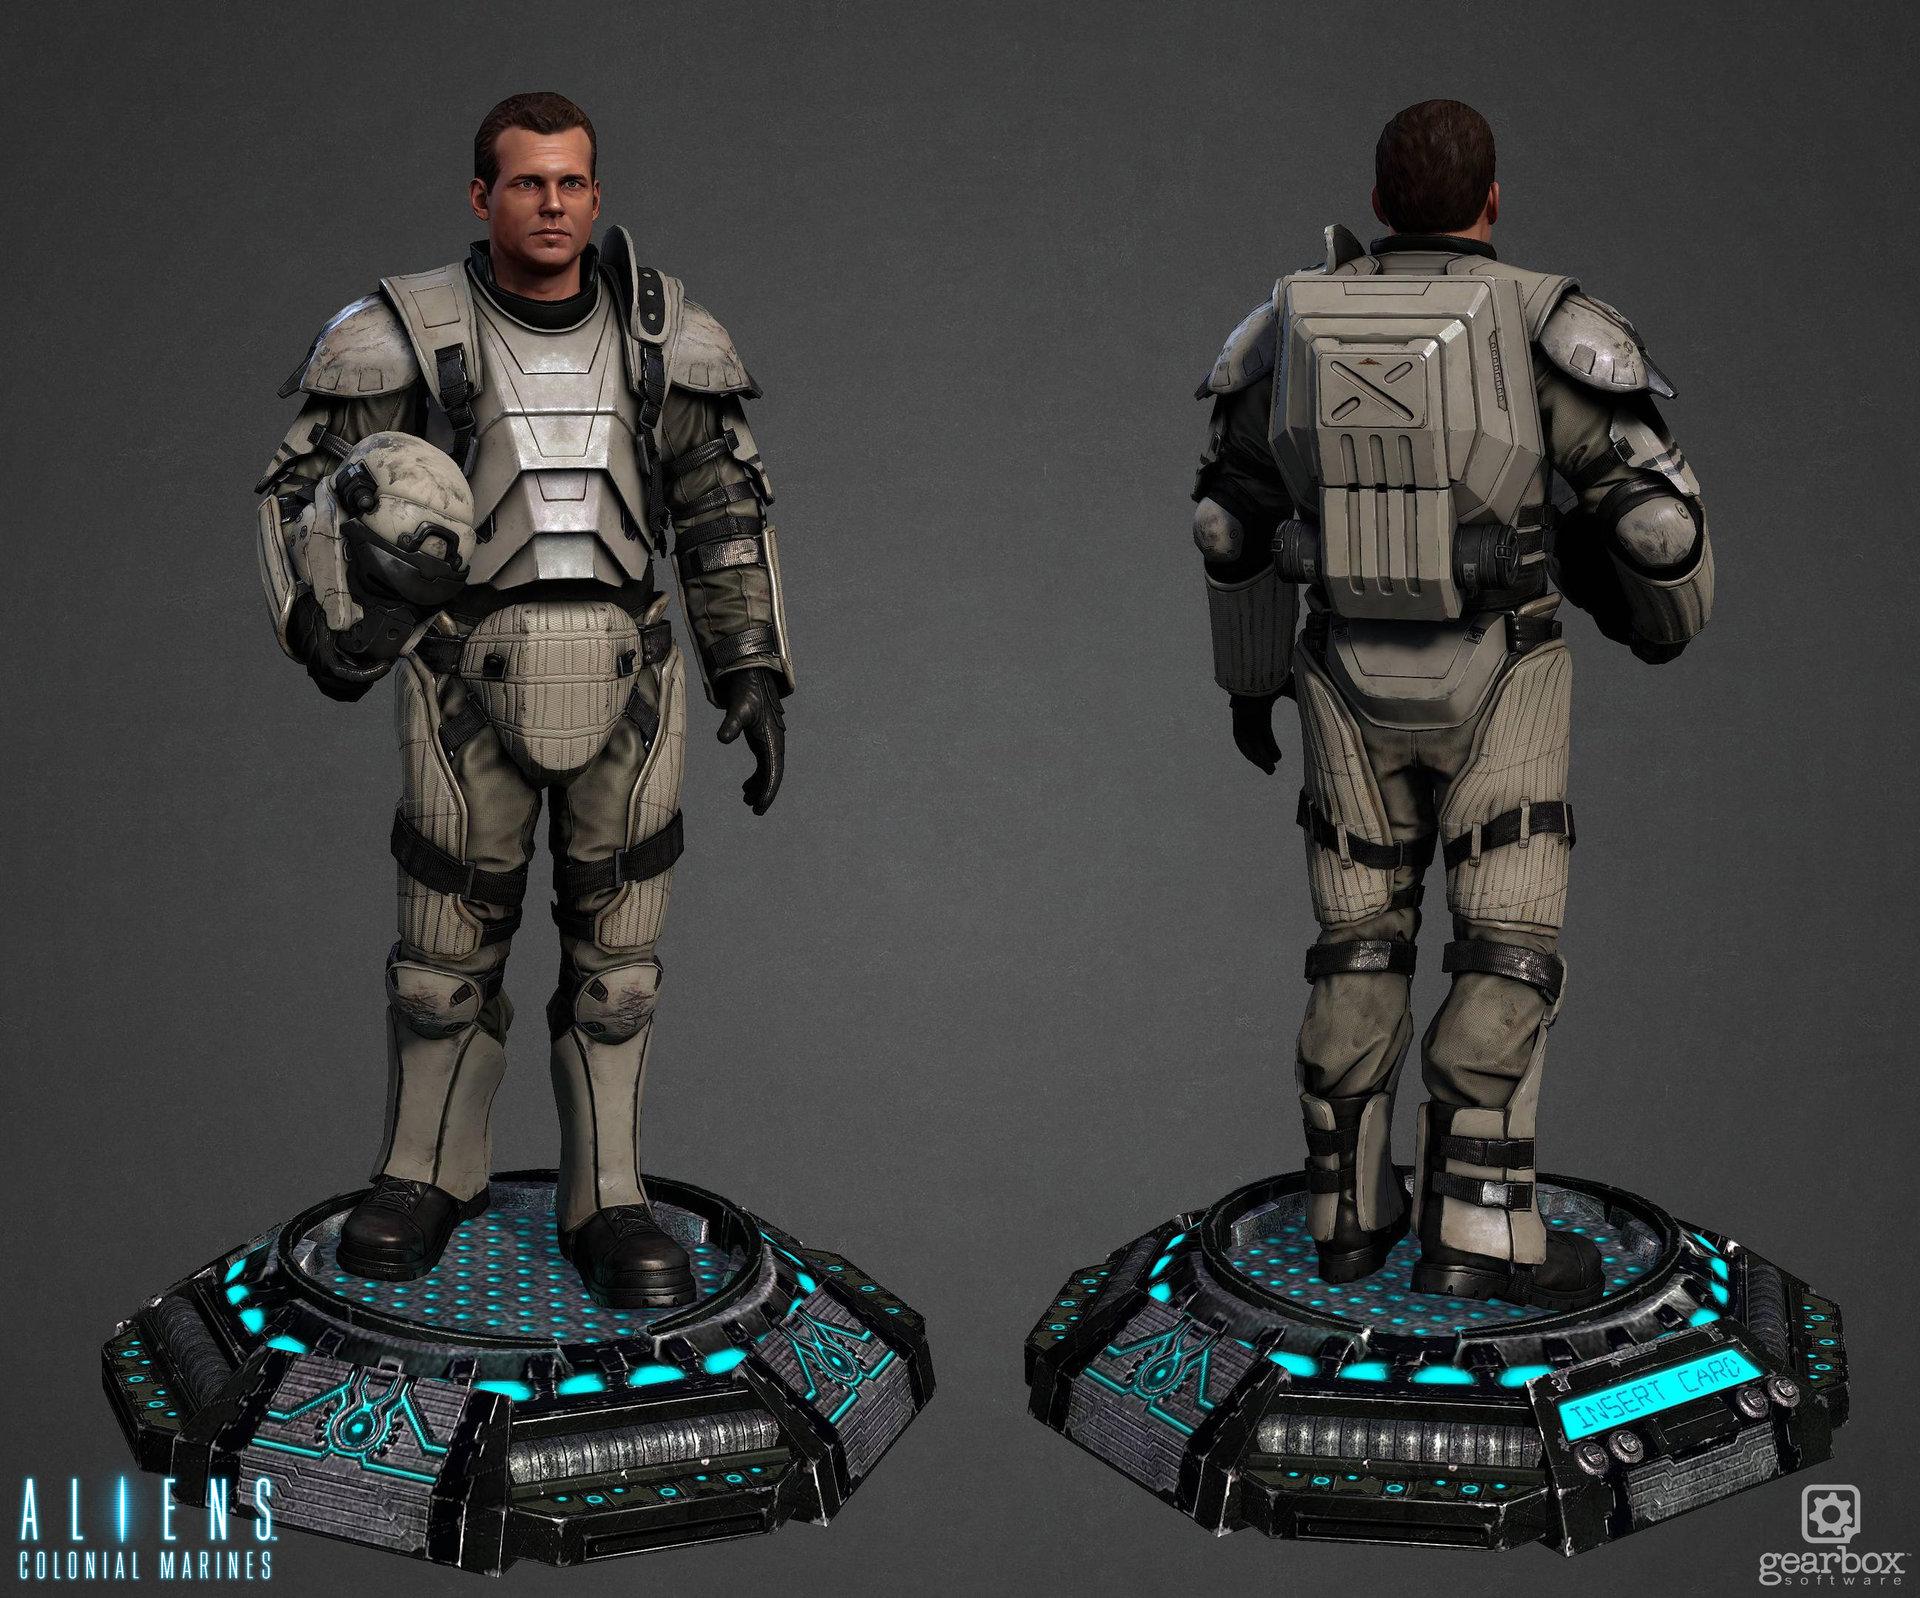 ArtStation - Hudson w/ Heavy Armor - Aliens Colonial Marines Tyler Bronis  sc 1 st  ArtStation & ArtStation - Hudson w/ Heavy Armor - Aliens: Colonial Marines Tyler ...